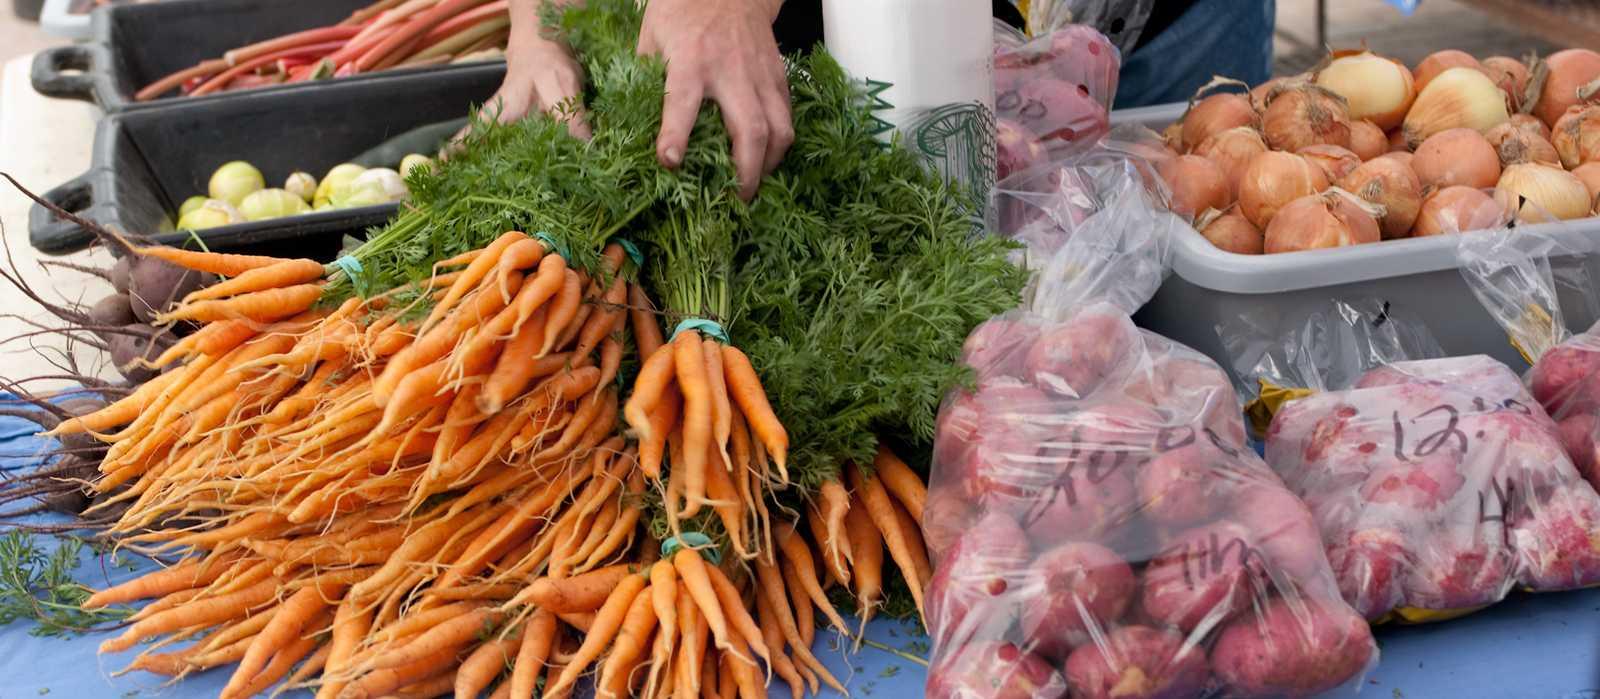 Seaport Farmers' Market in Halifax